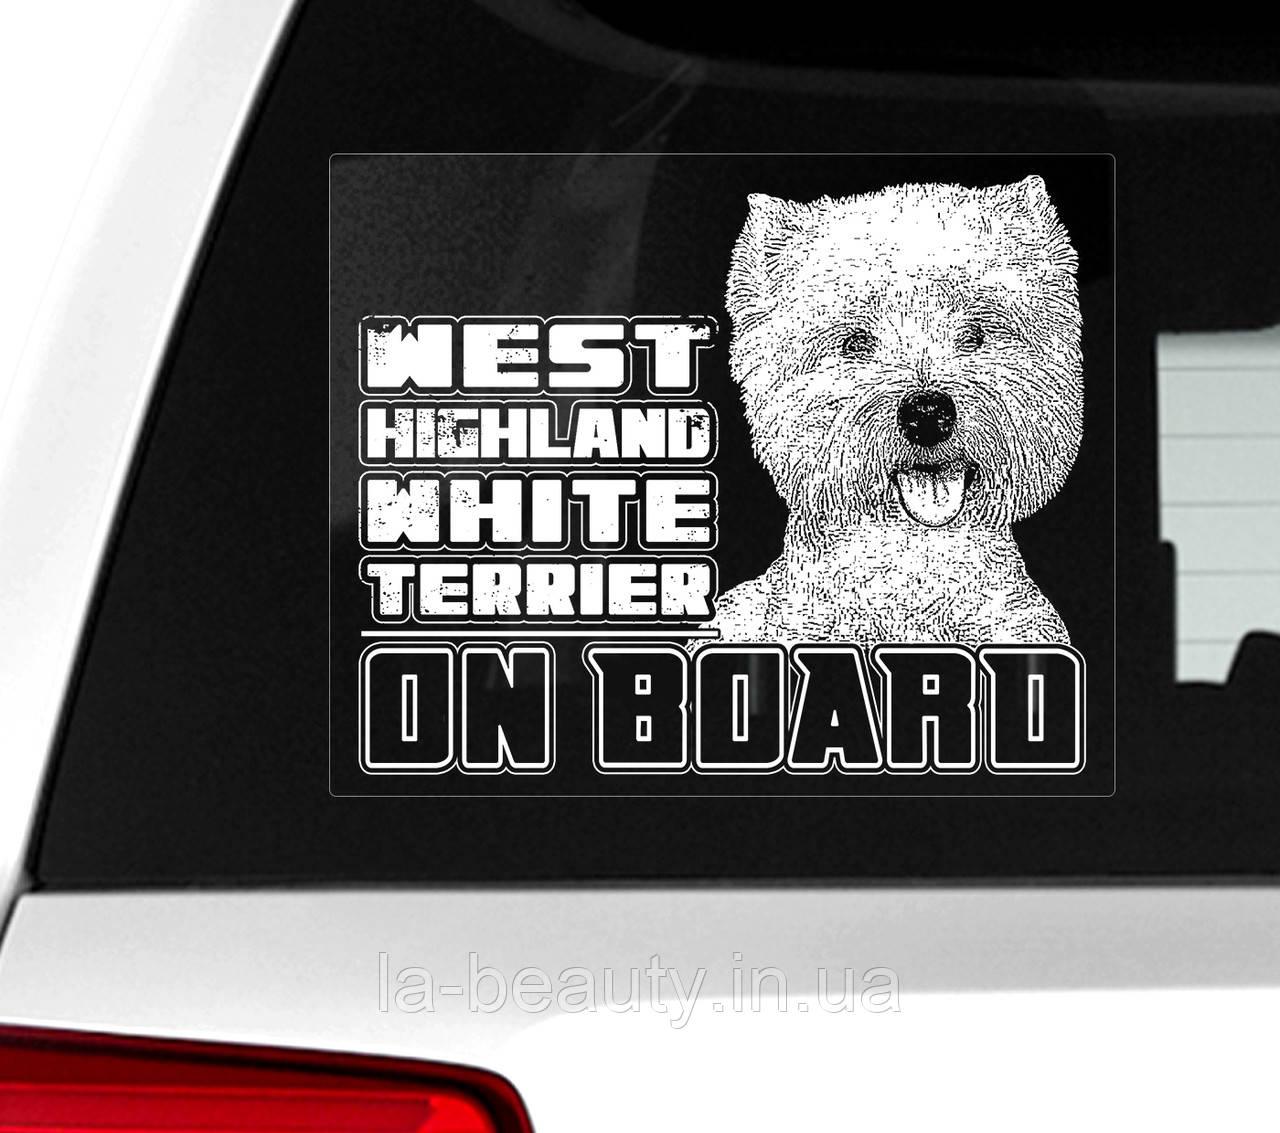 Наклейка на авто / машину Вест Хайленд Уайт Терьер на борту